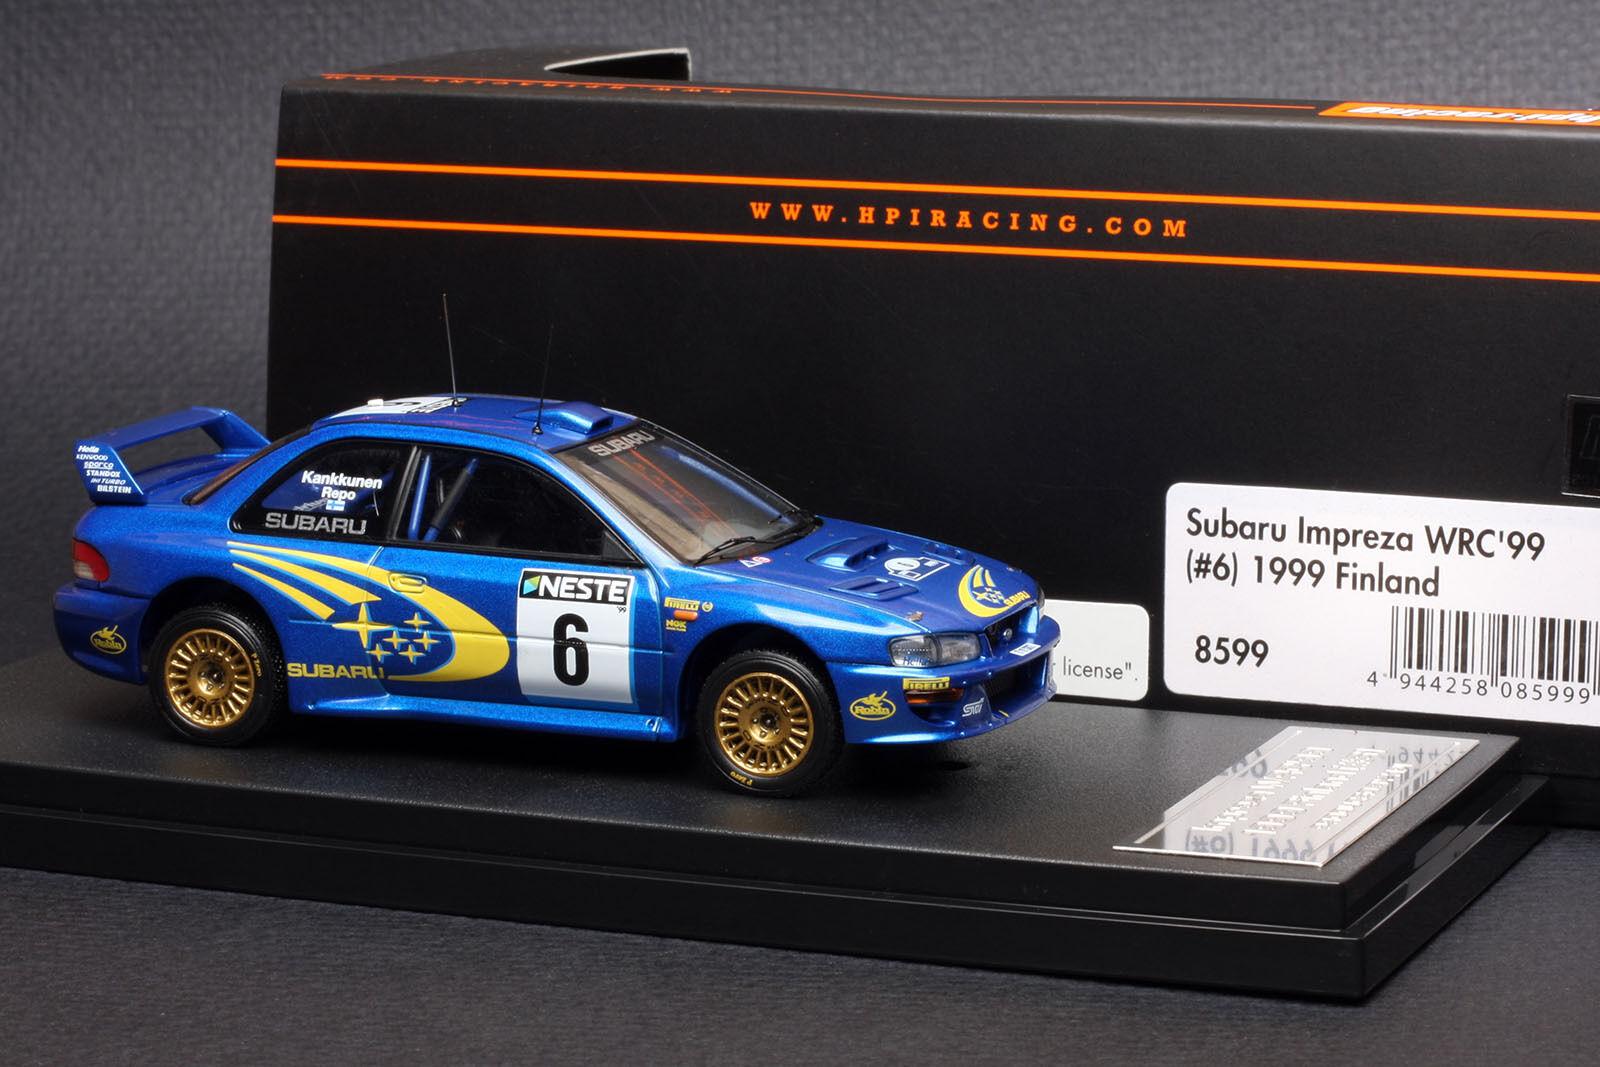 Subaru  Impreza  6 1999 Finland Rally  Juha Kankkunen  -- HPI  8599 1 43  détaillants en ligne